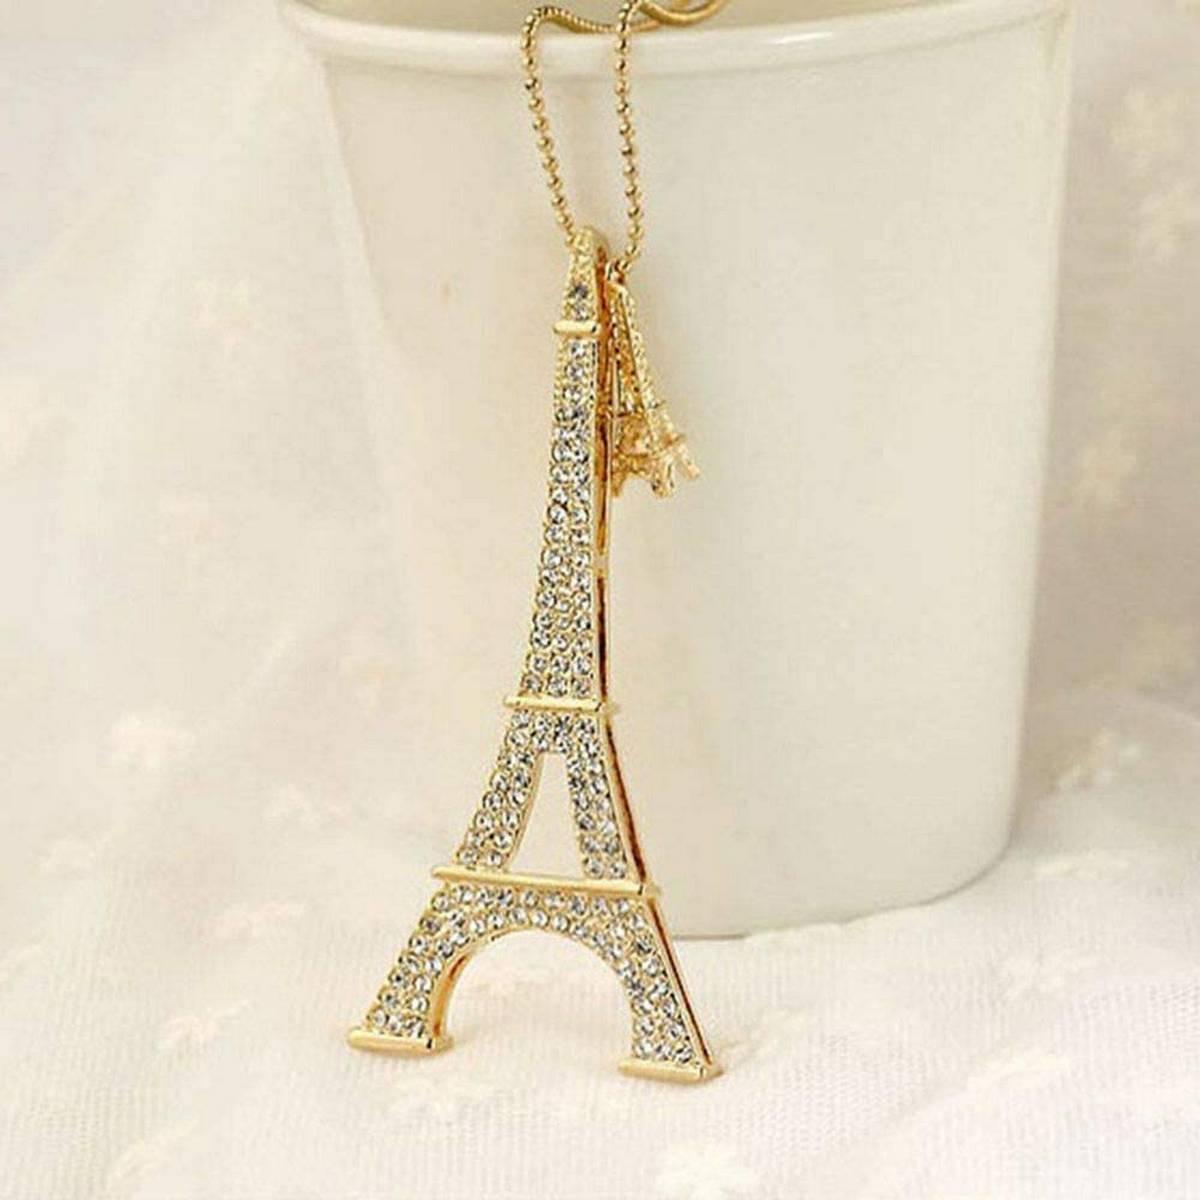 New Fishion Jewelry Paris Eiffel Tower Pendant Fashion Jewelry Necklace for Girls